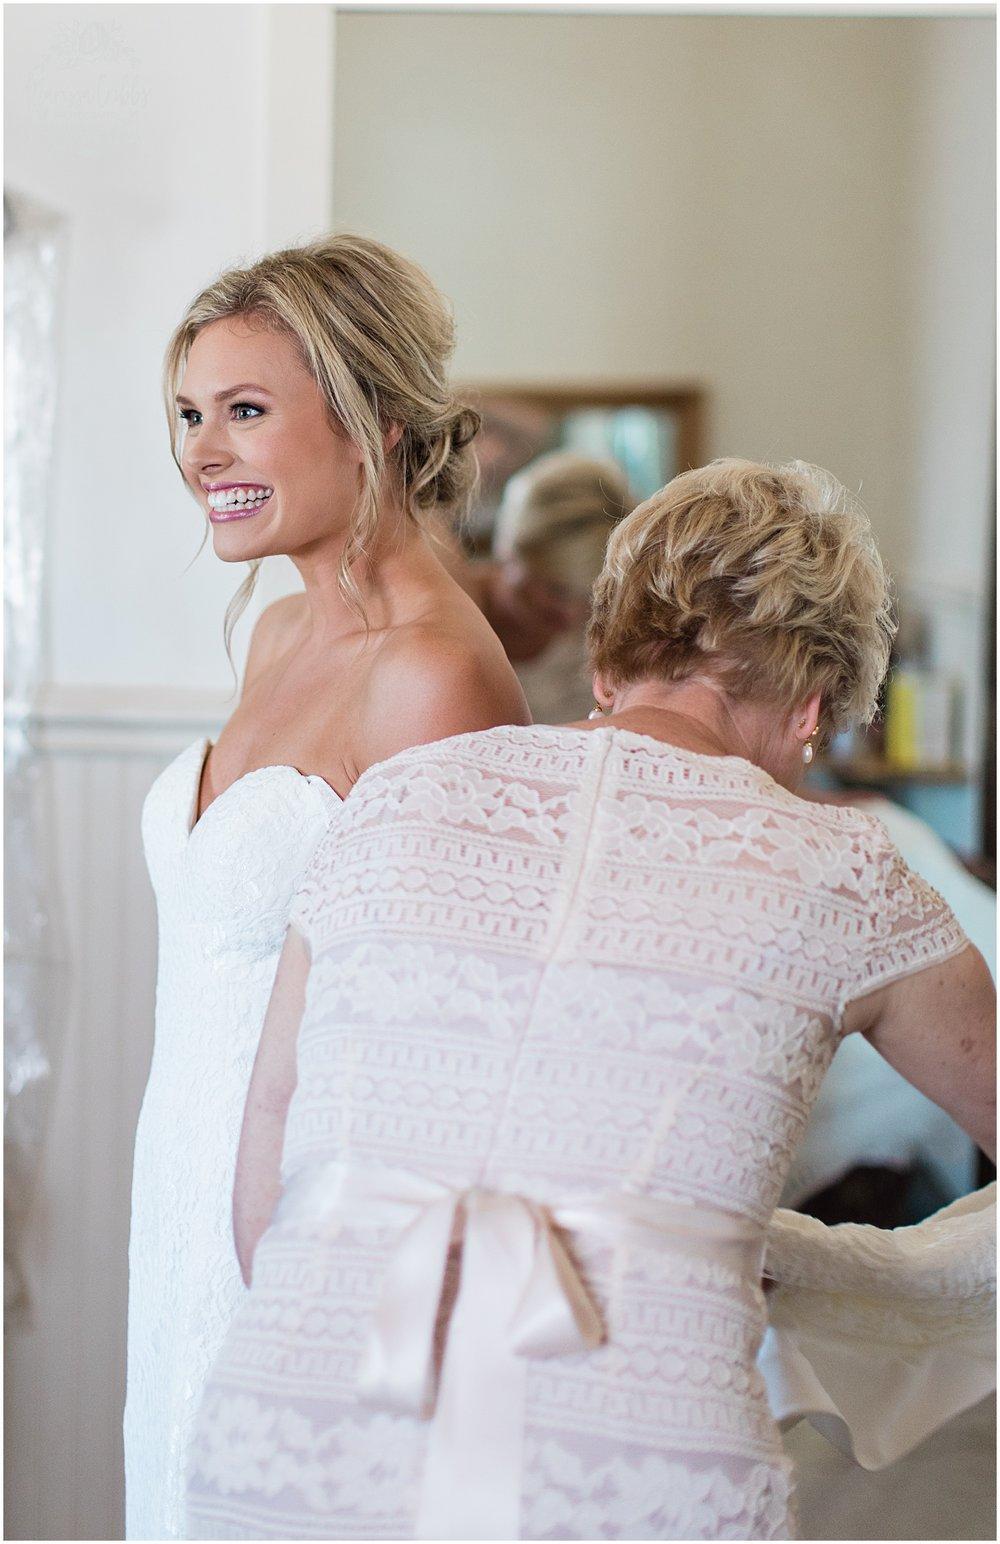 RHODES WEDDING | WESTON RED BARN FARM | MARISSA CRIBBS PHOTOGRAPHY_5211.jpg